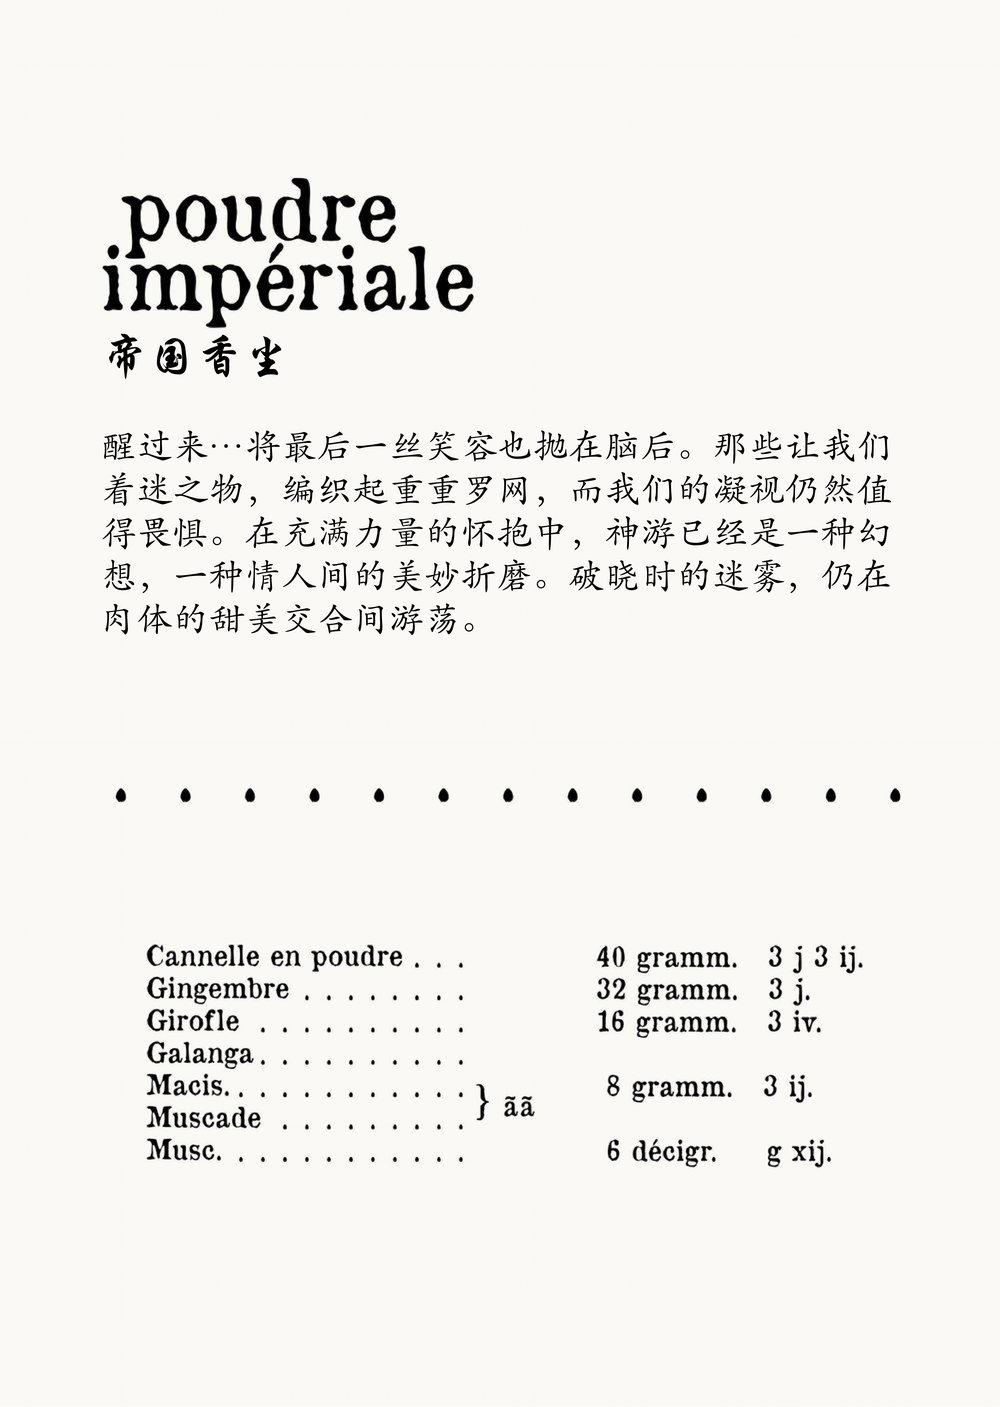 poudre impériale recipe